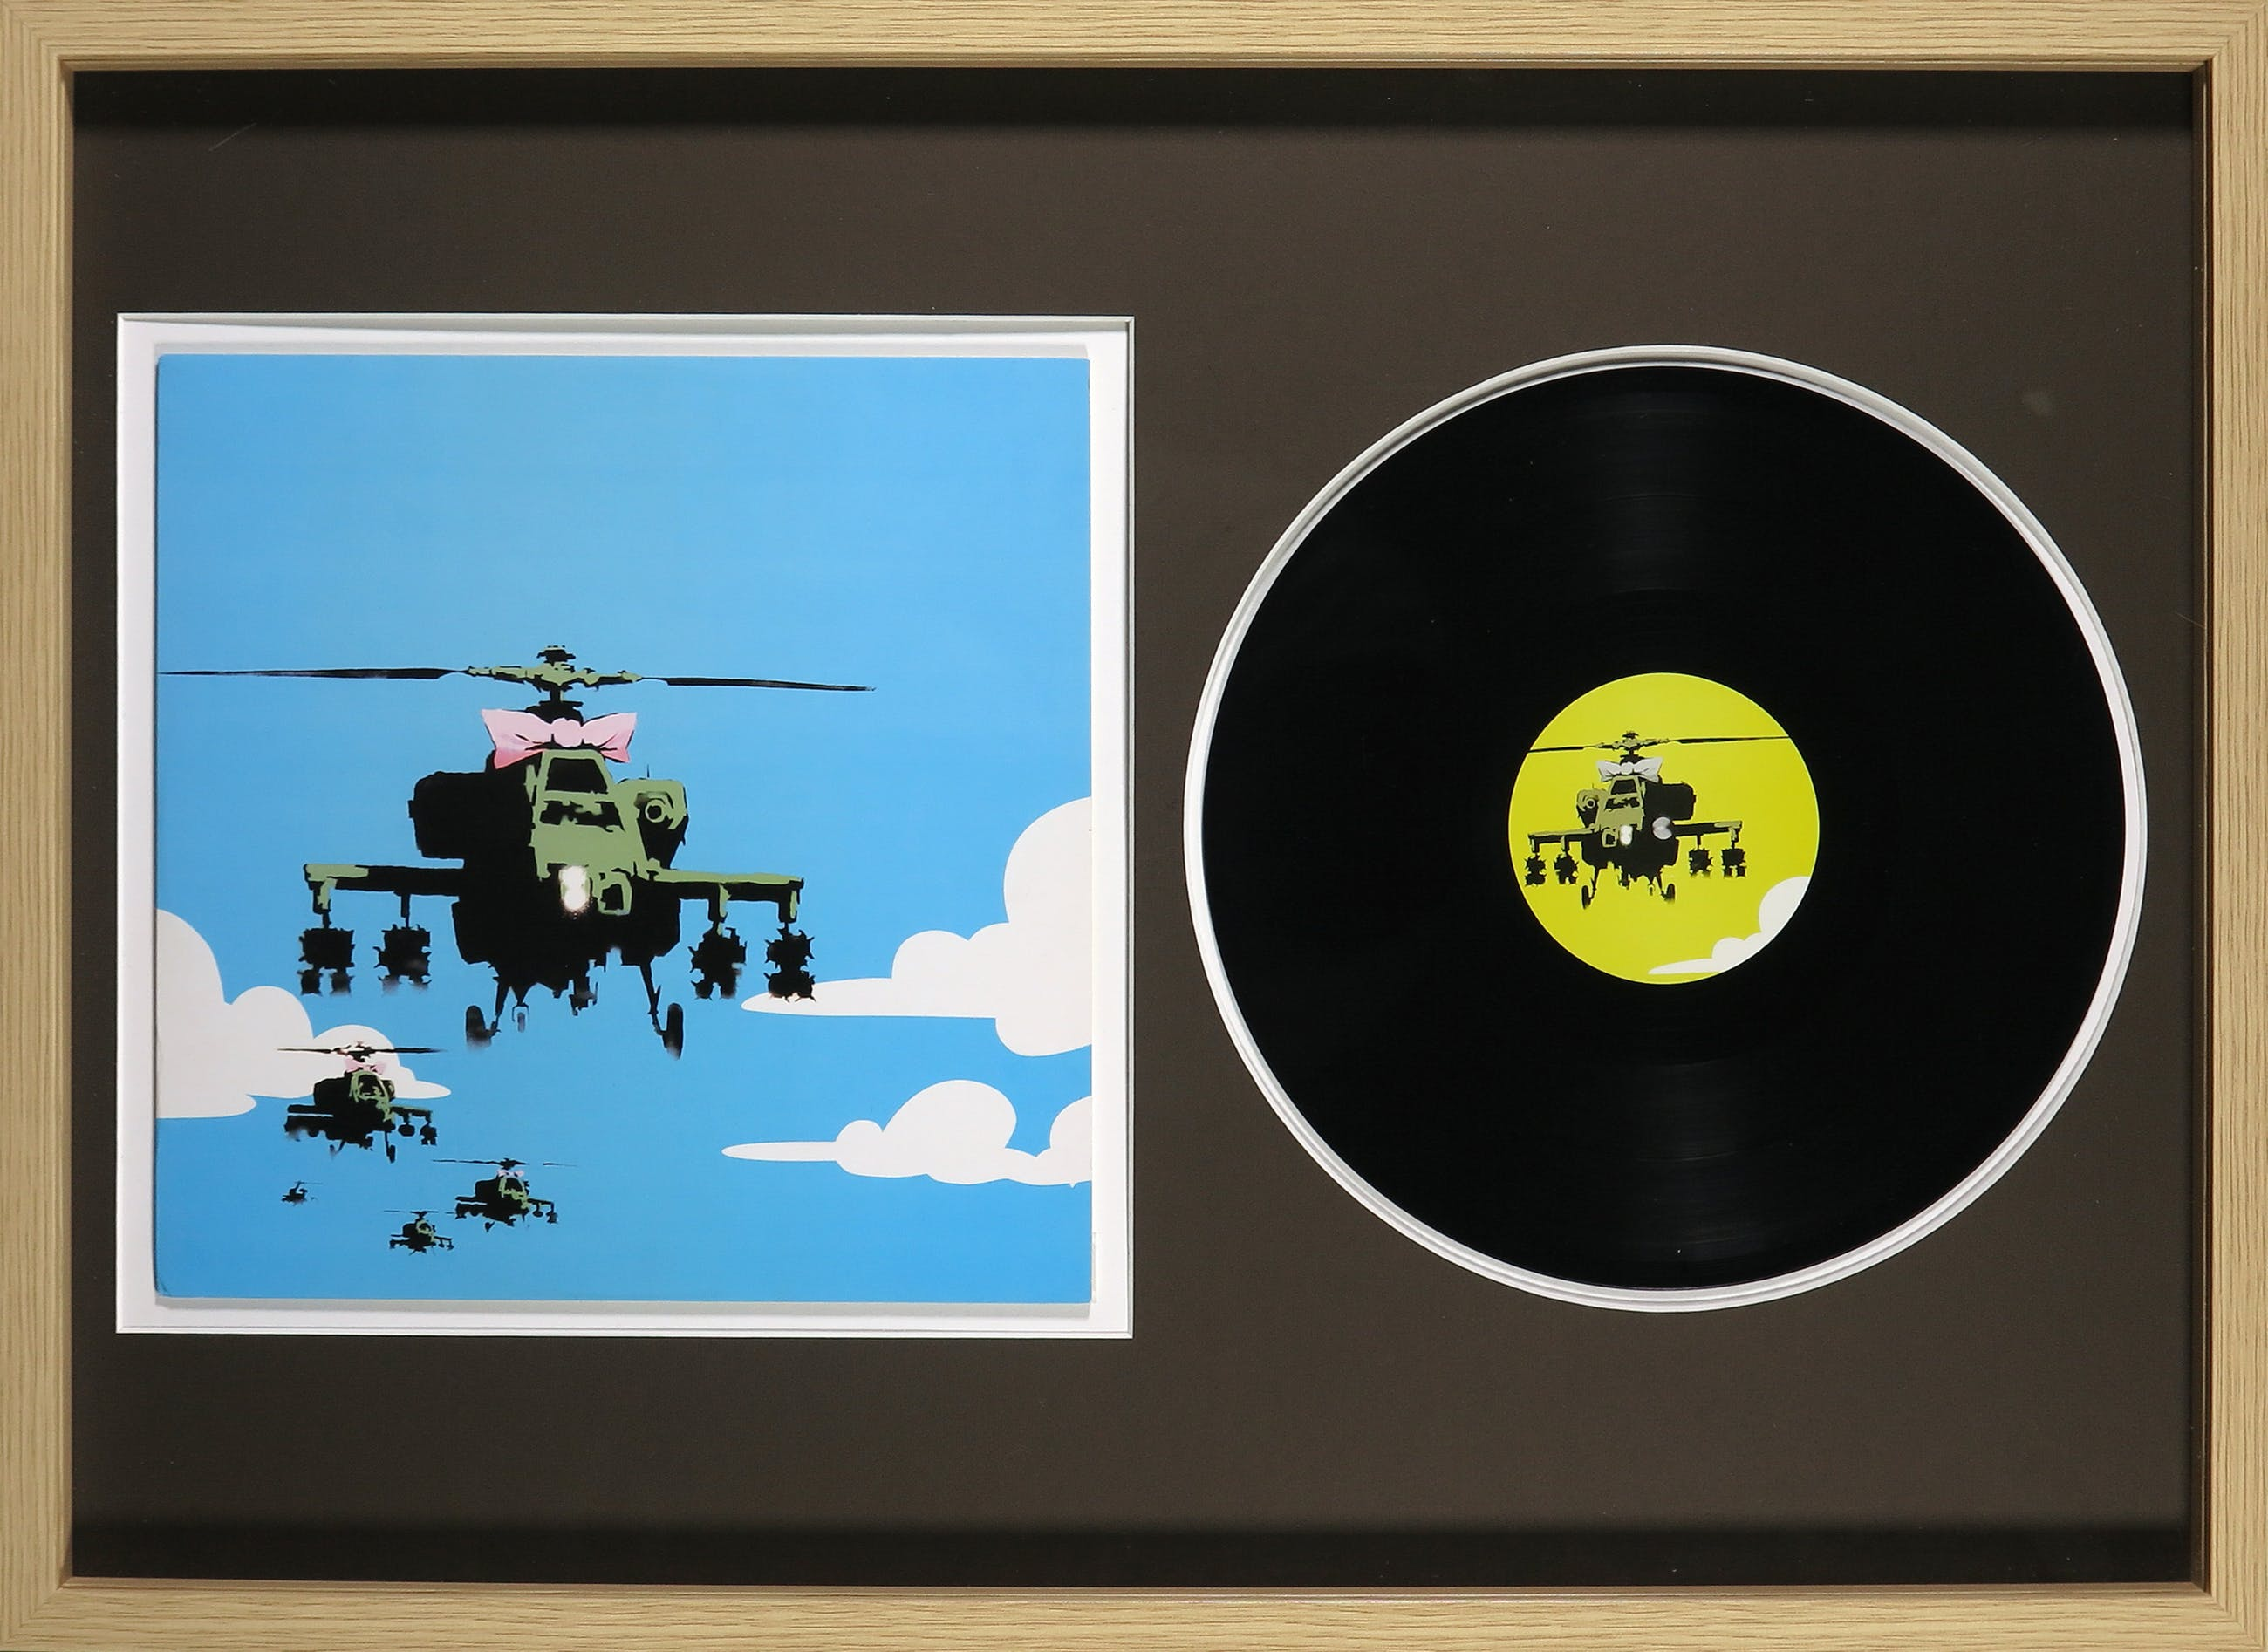 Banksy - Dirty Funker - Flat Beat - Ingelijst kopen? Bied vanaf 1!